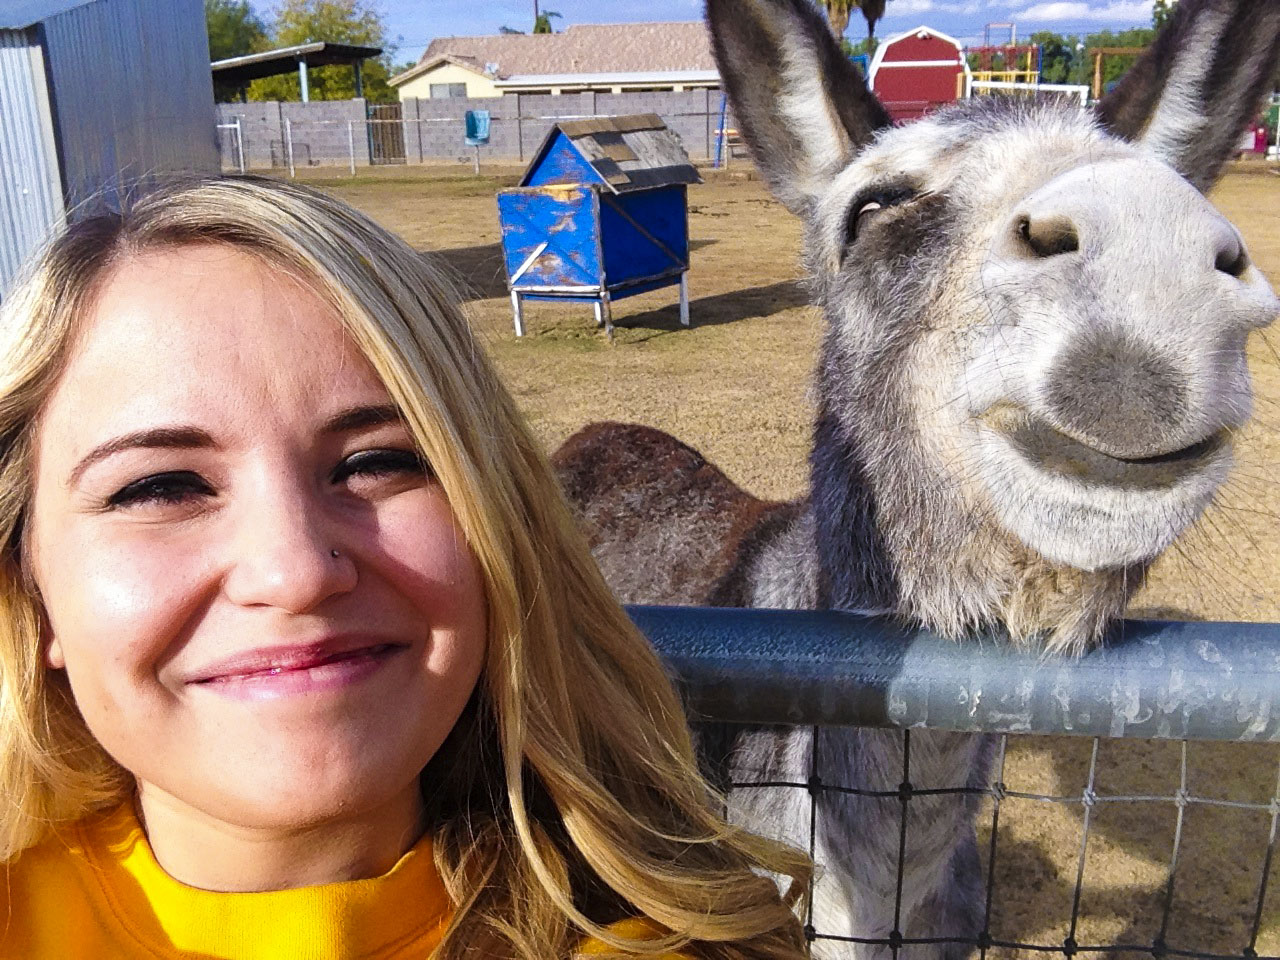 selfie-with-animals-8